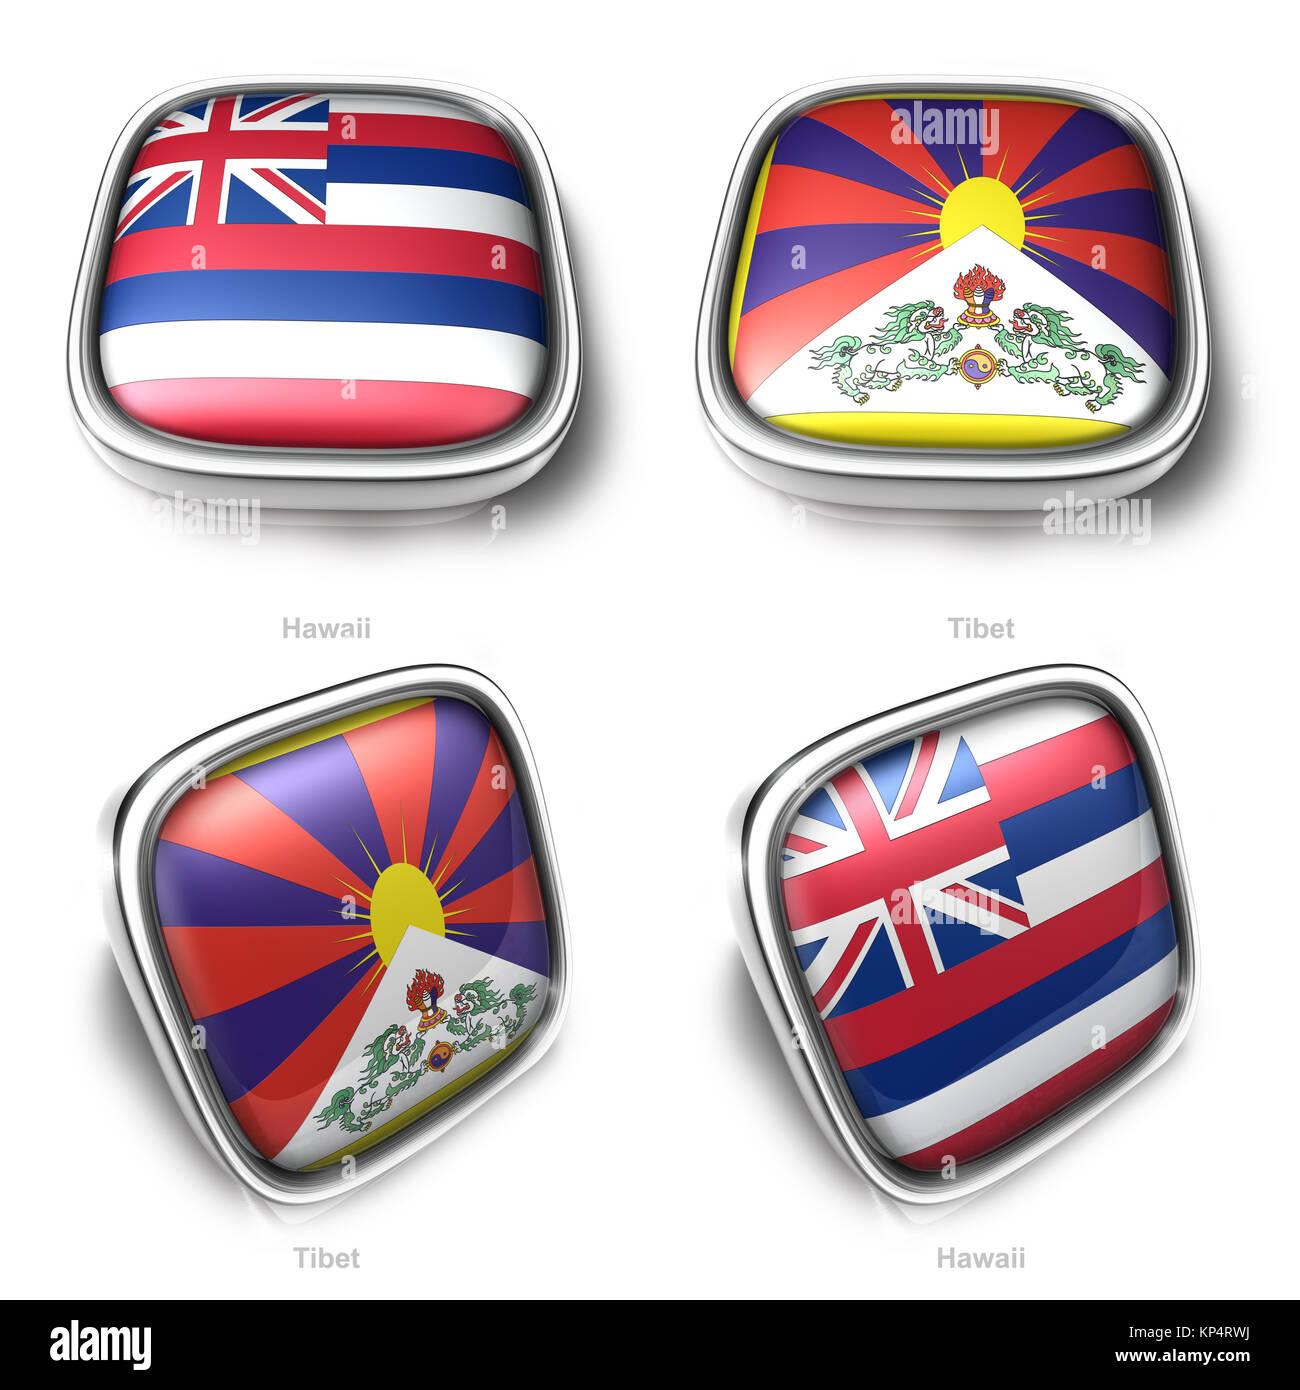 3d Hawaii and Tibet flag button - Stock Image